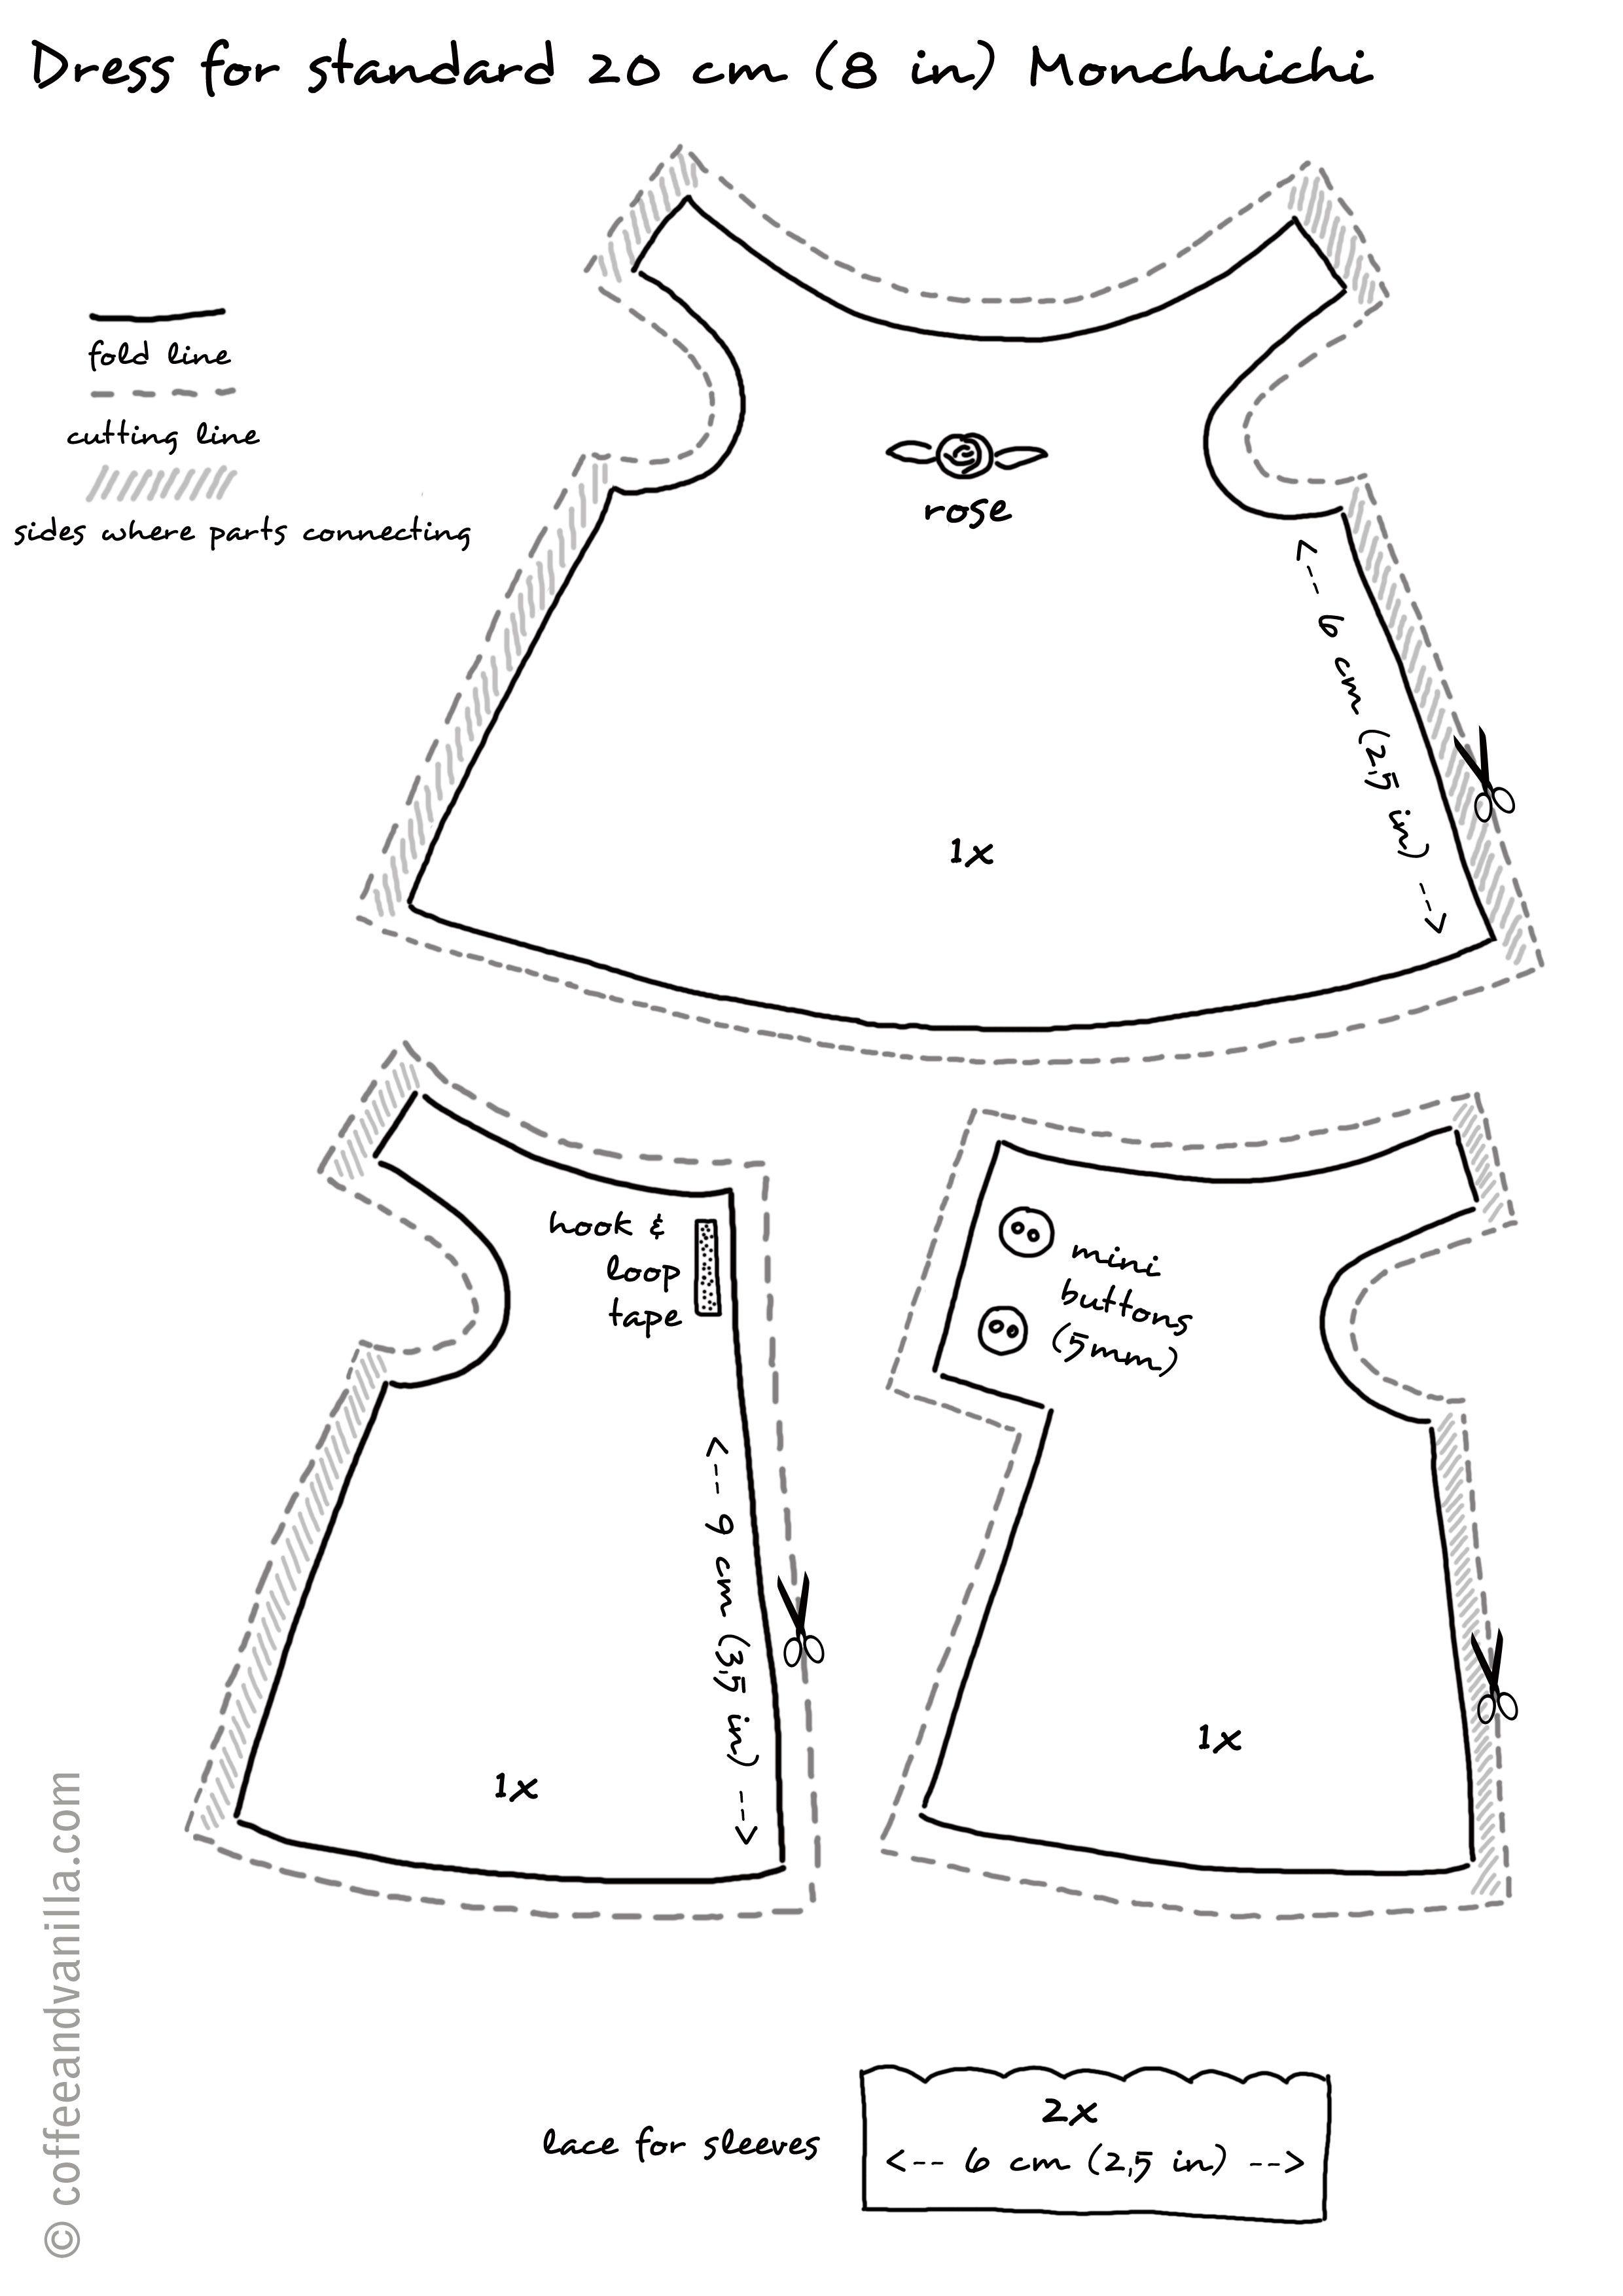 Handmade Dress For Monchhichi | Doll's Dress & Accessories - Barbie Dress Patterns Free Printable Pdf